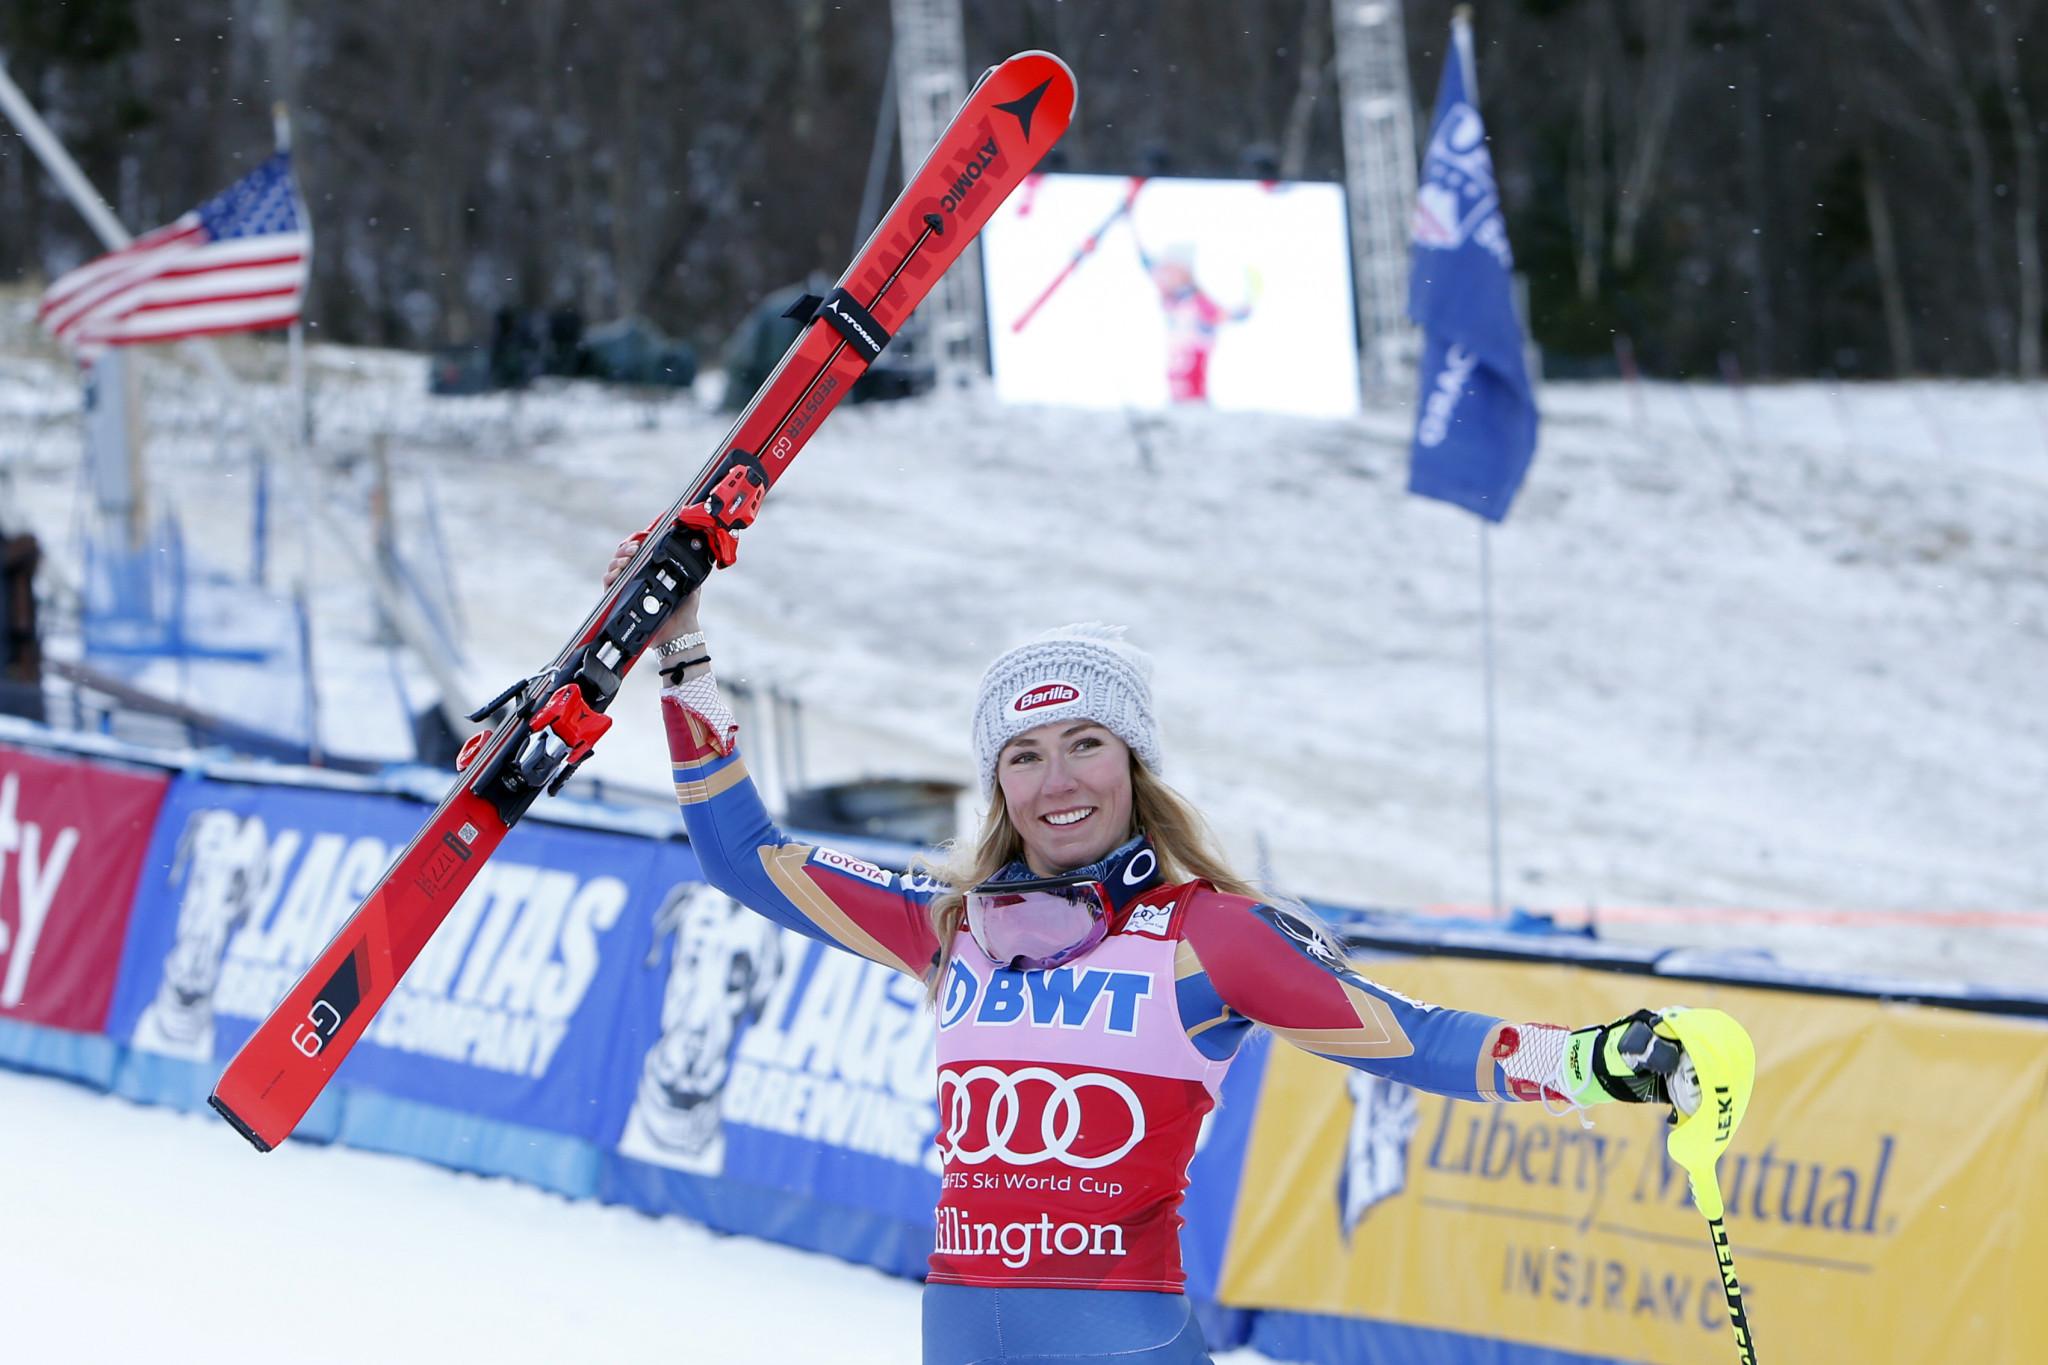 Shiffrin dominates women's slalom at FIS Alpine Skiing World Cup in Killington